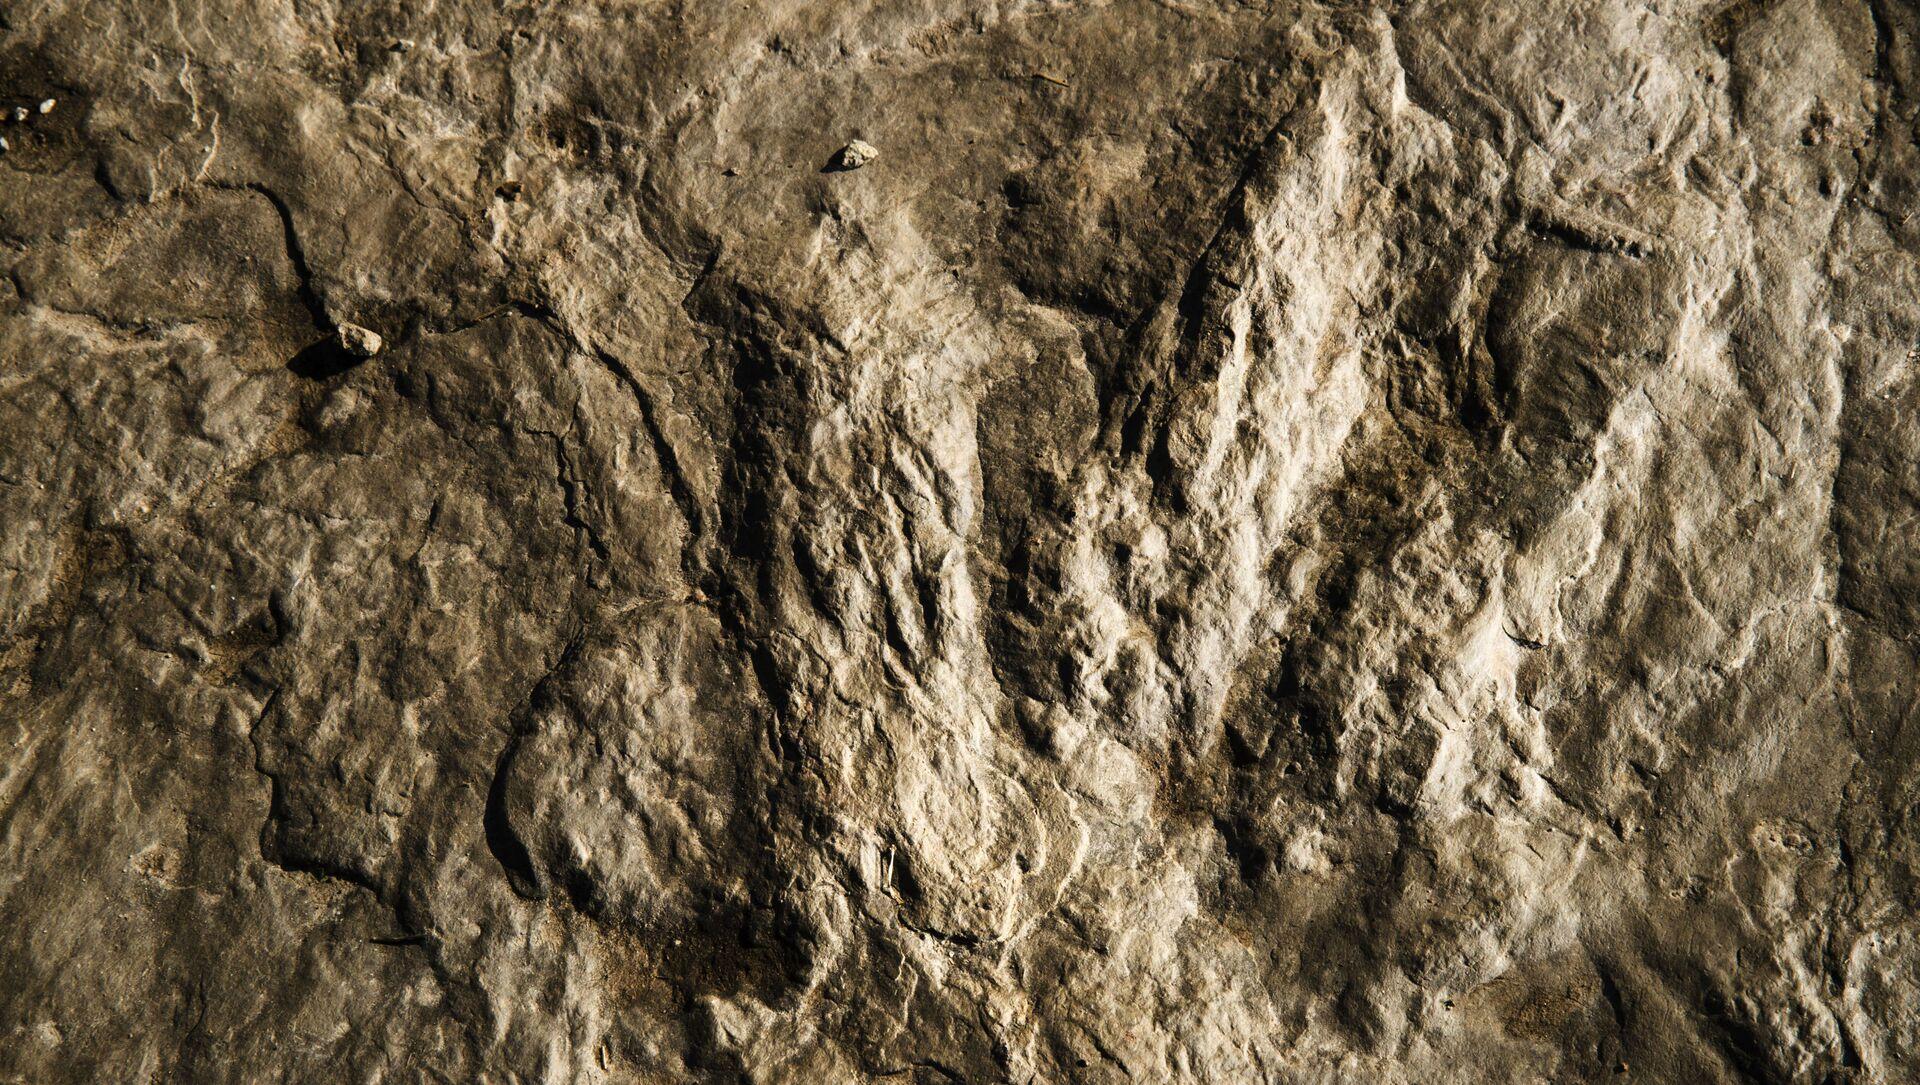 La huella fosilizada de un dinosaurio - Sputnik Mundo, 1920, 31.01.2021